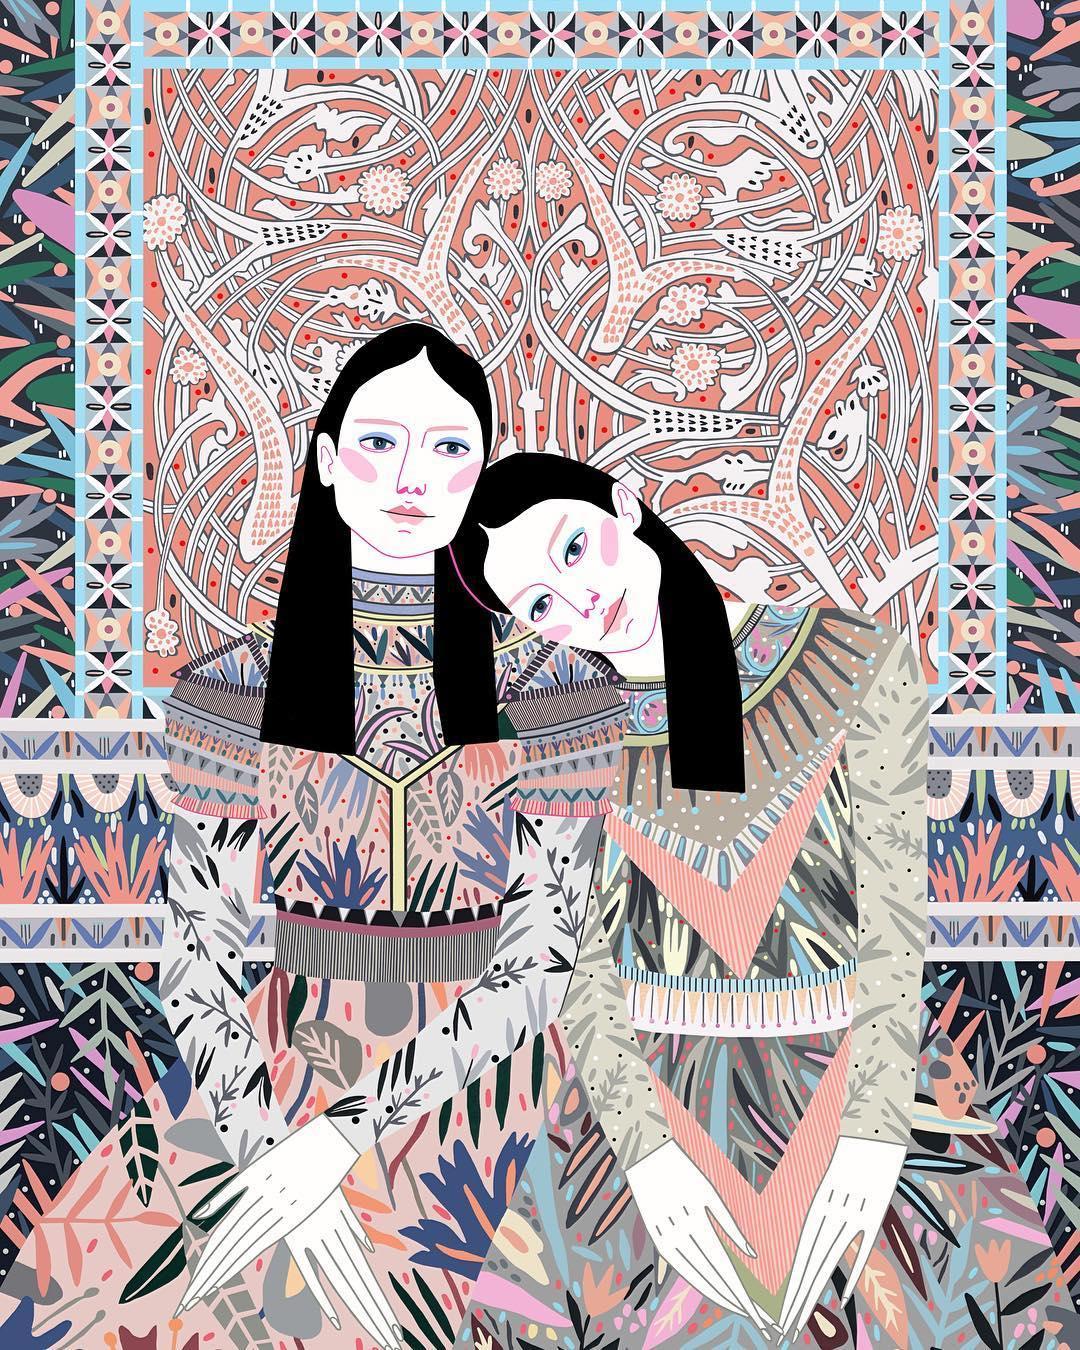 Fashion illustration by Sasha Ignatiadou